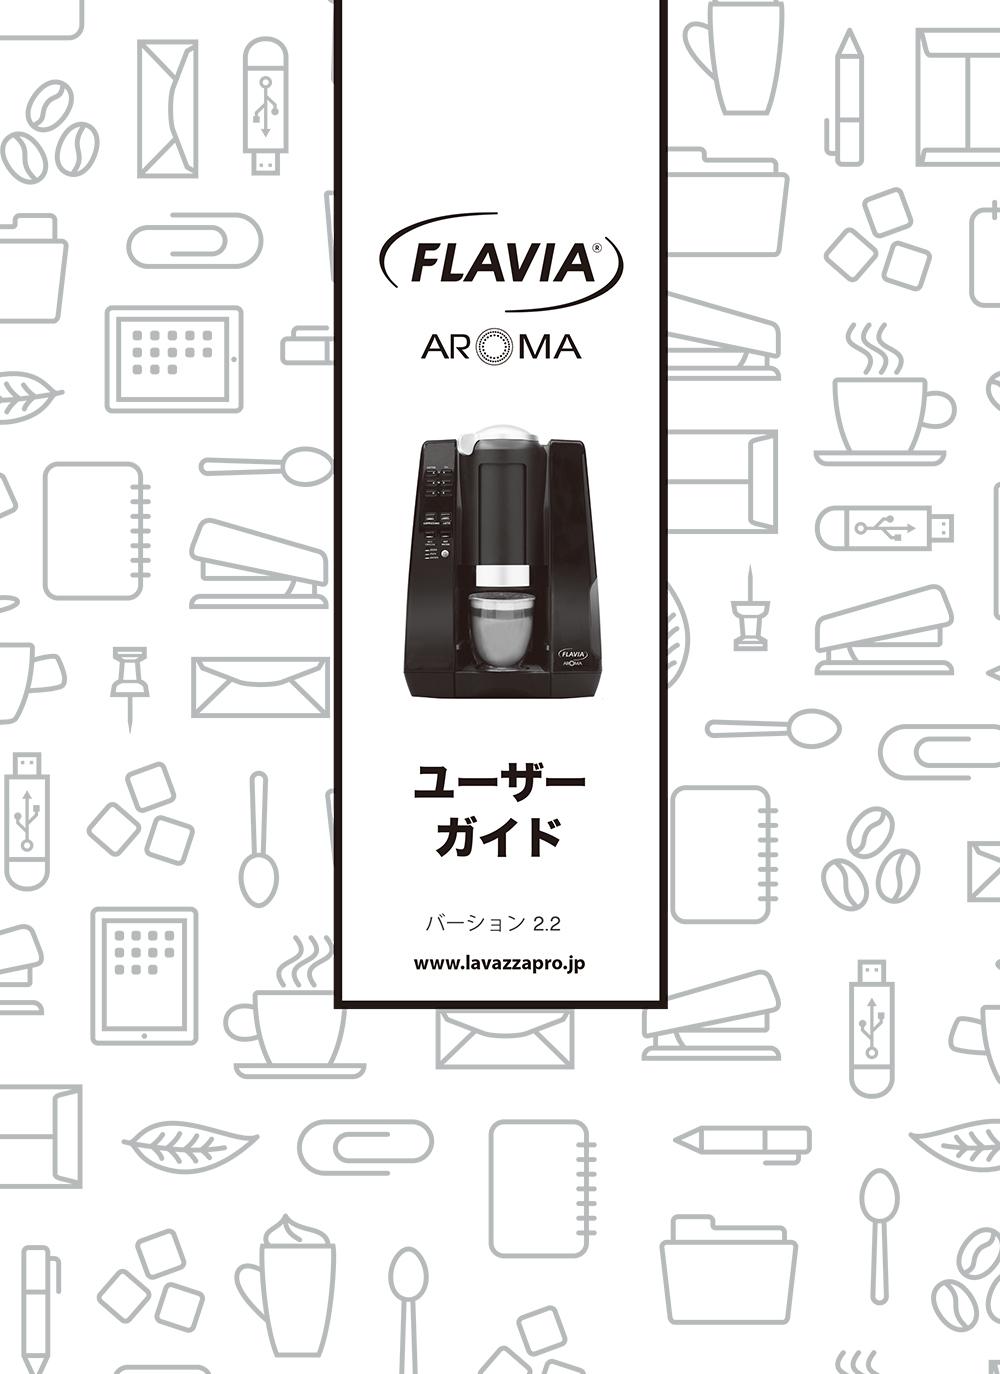 Flavia AROMAユーザーガイド